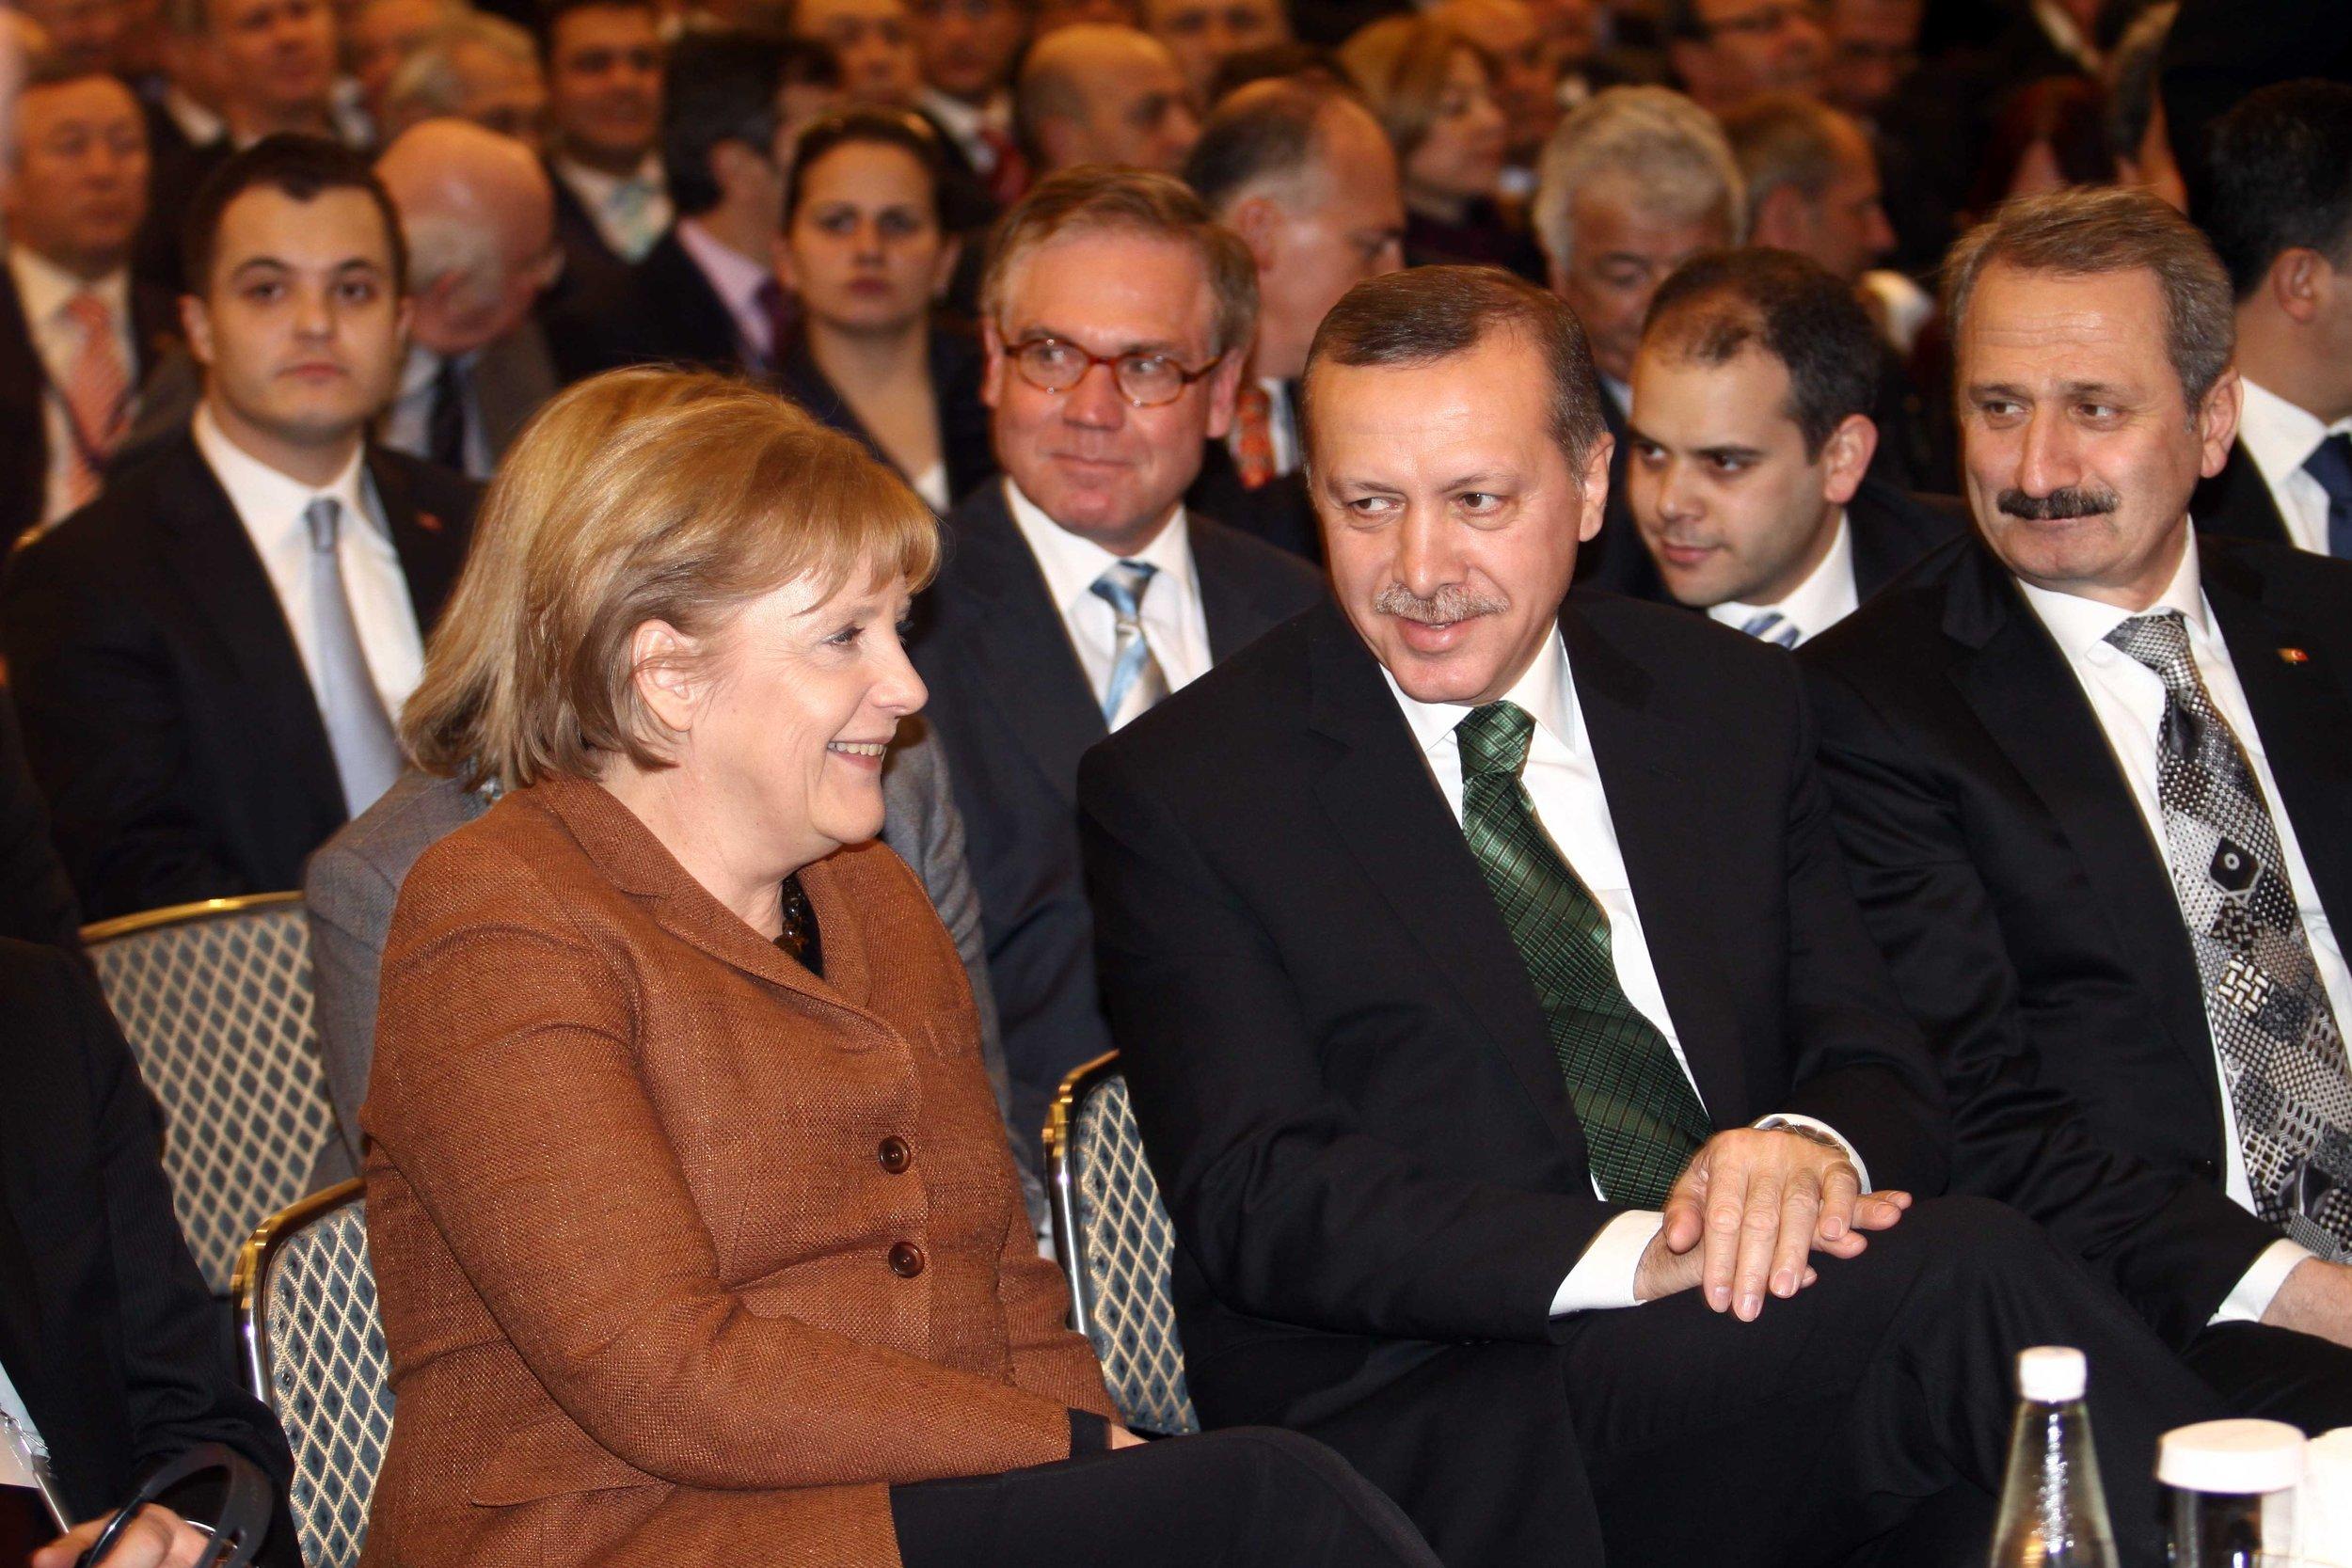 bigstock-Angela-Merkel-and-Recep-Tayyip-116034452.jpg